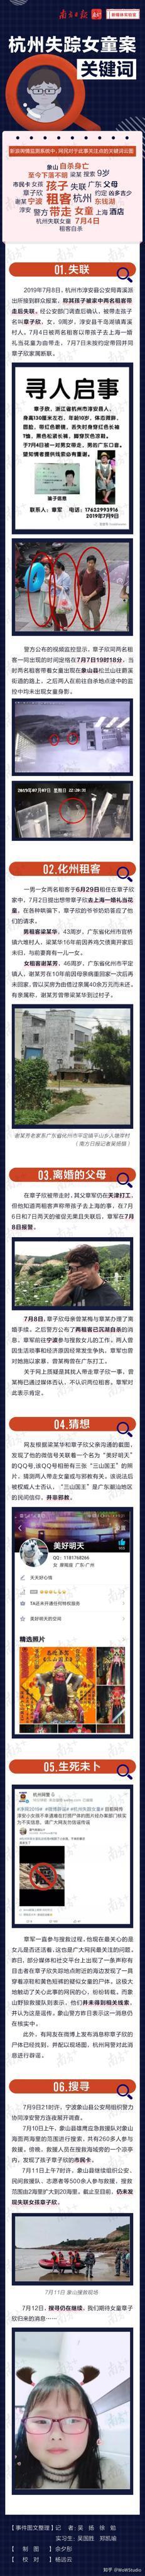 www.sina.com.cn_sina.com.cn/c/t/2019-07-11/doc-ihytcerm2877409.